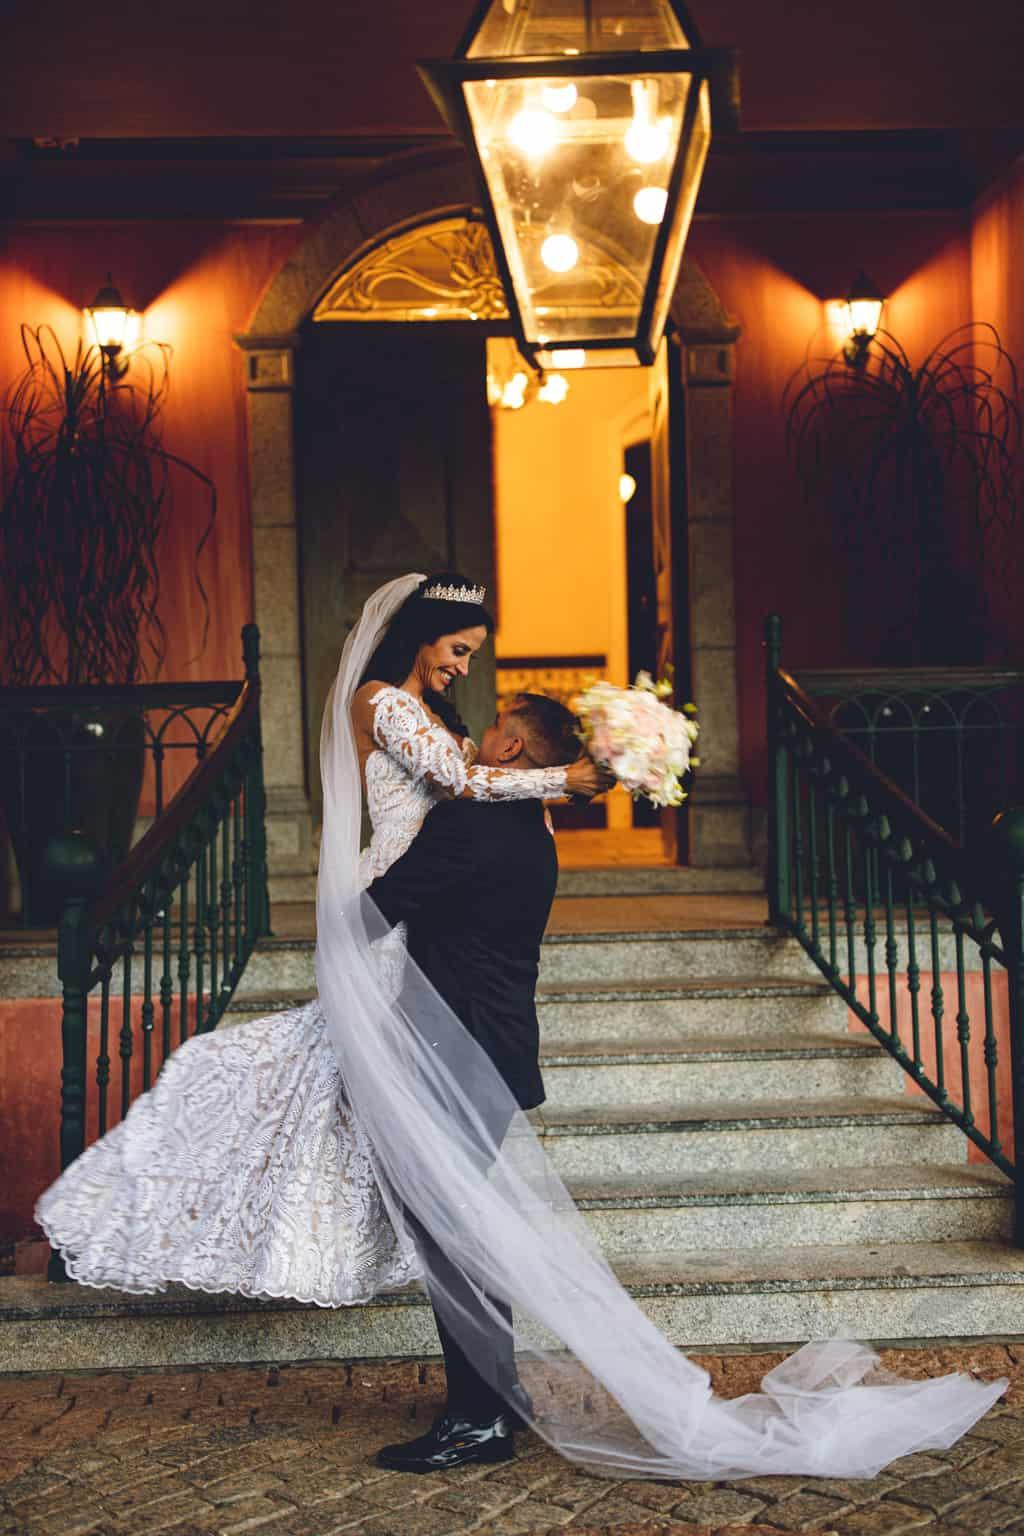 Casamento-de-Bianka-e-Nilo-Fotografia-Marcelo-Schmoeller-SC-Alameda-Casa-Rosa-03082019_bianka-e-nilo_2051